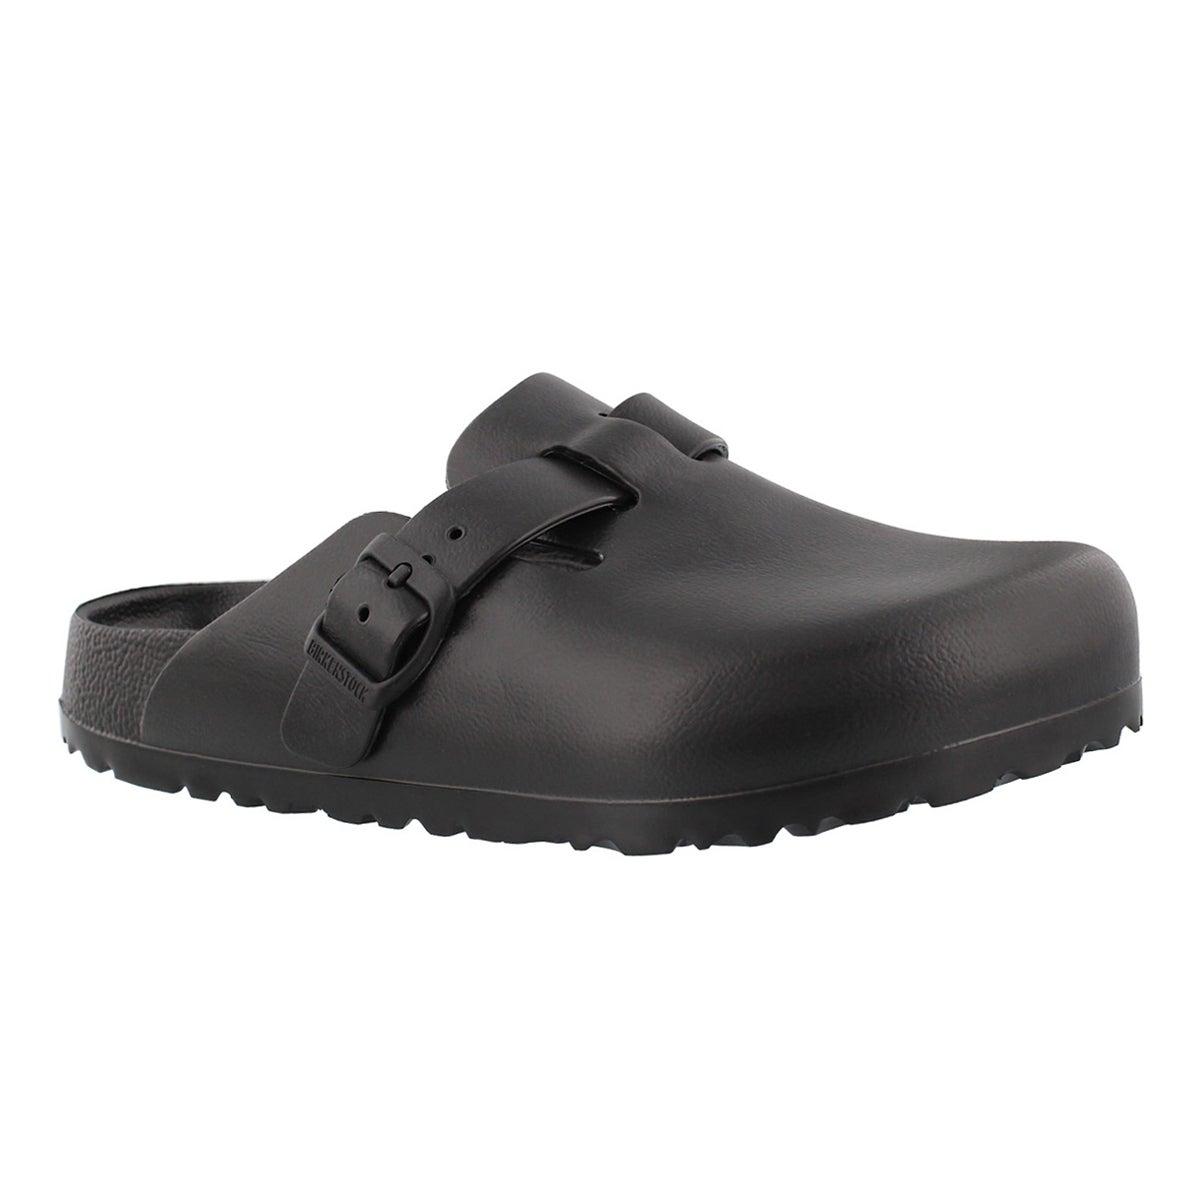 Women's BOSTON black EVA casual clogs